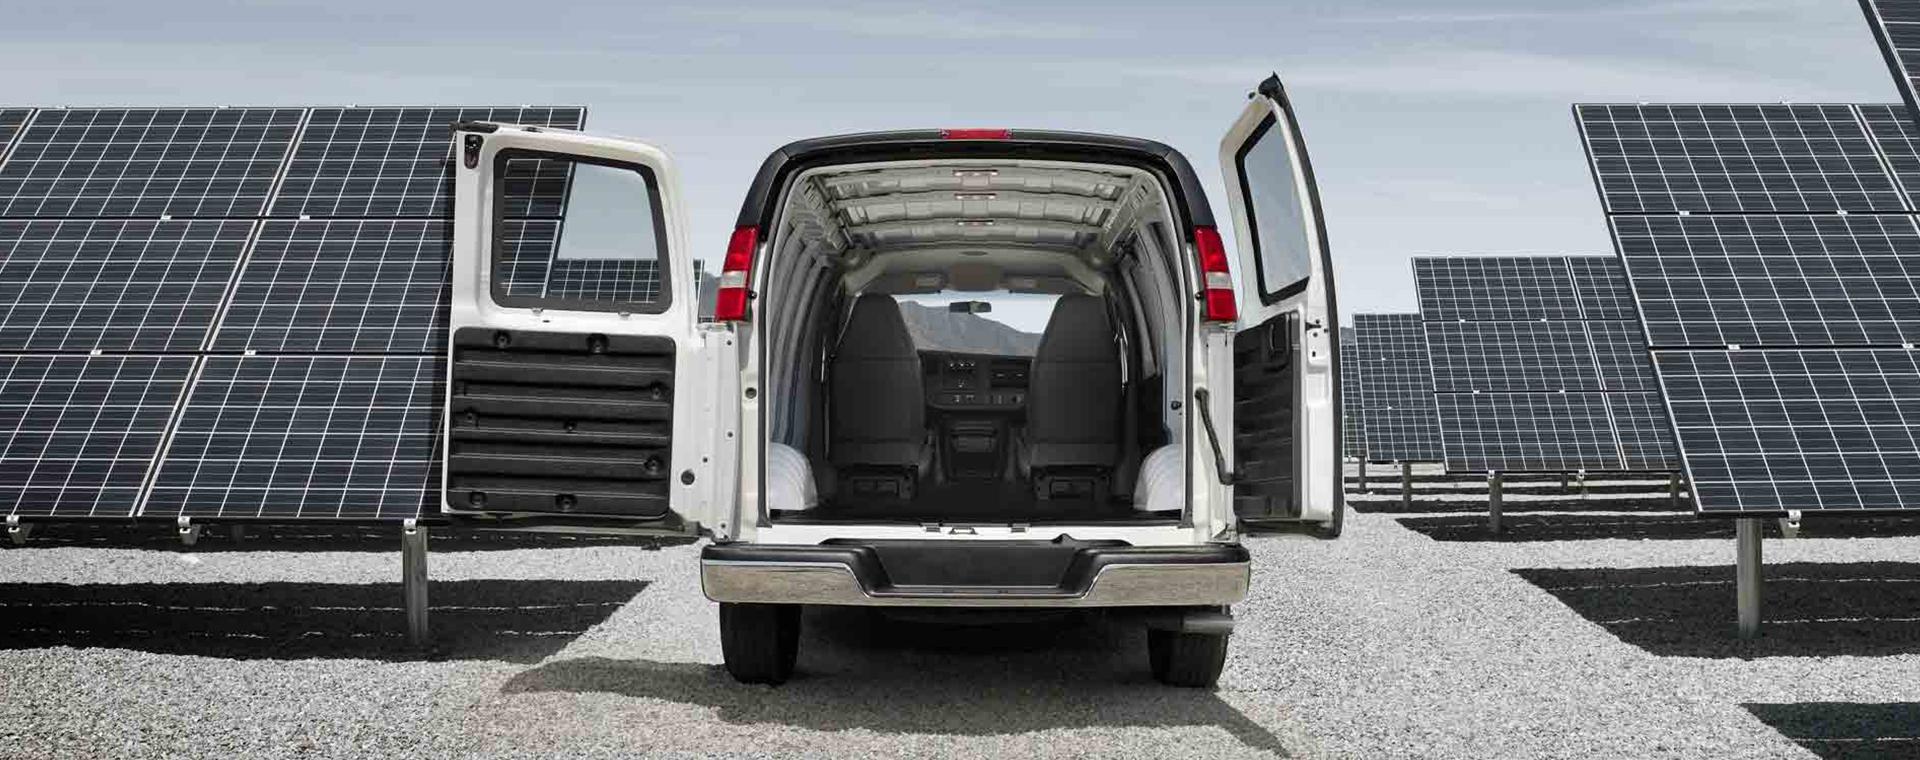 New Savana Cargo Van inventory at Quirk Buick GMC